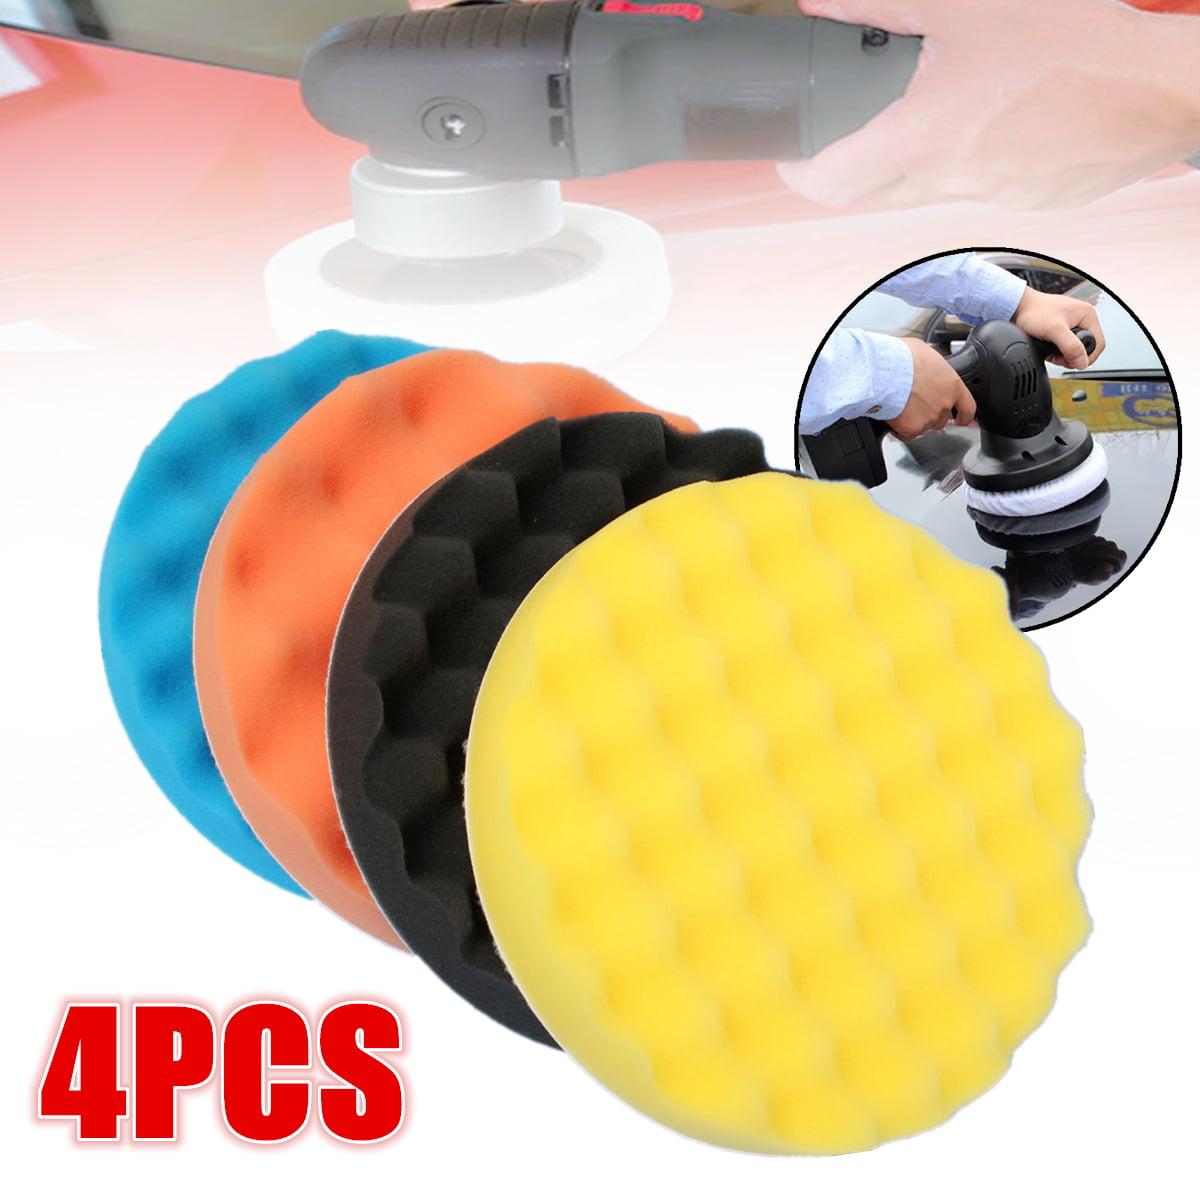 4Pcs 7''/180mm Sponge Foam Buffing Pad Waffle Polishing Buffer Pad Kit For Car Auto Polisher